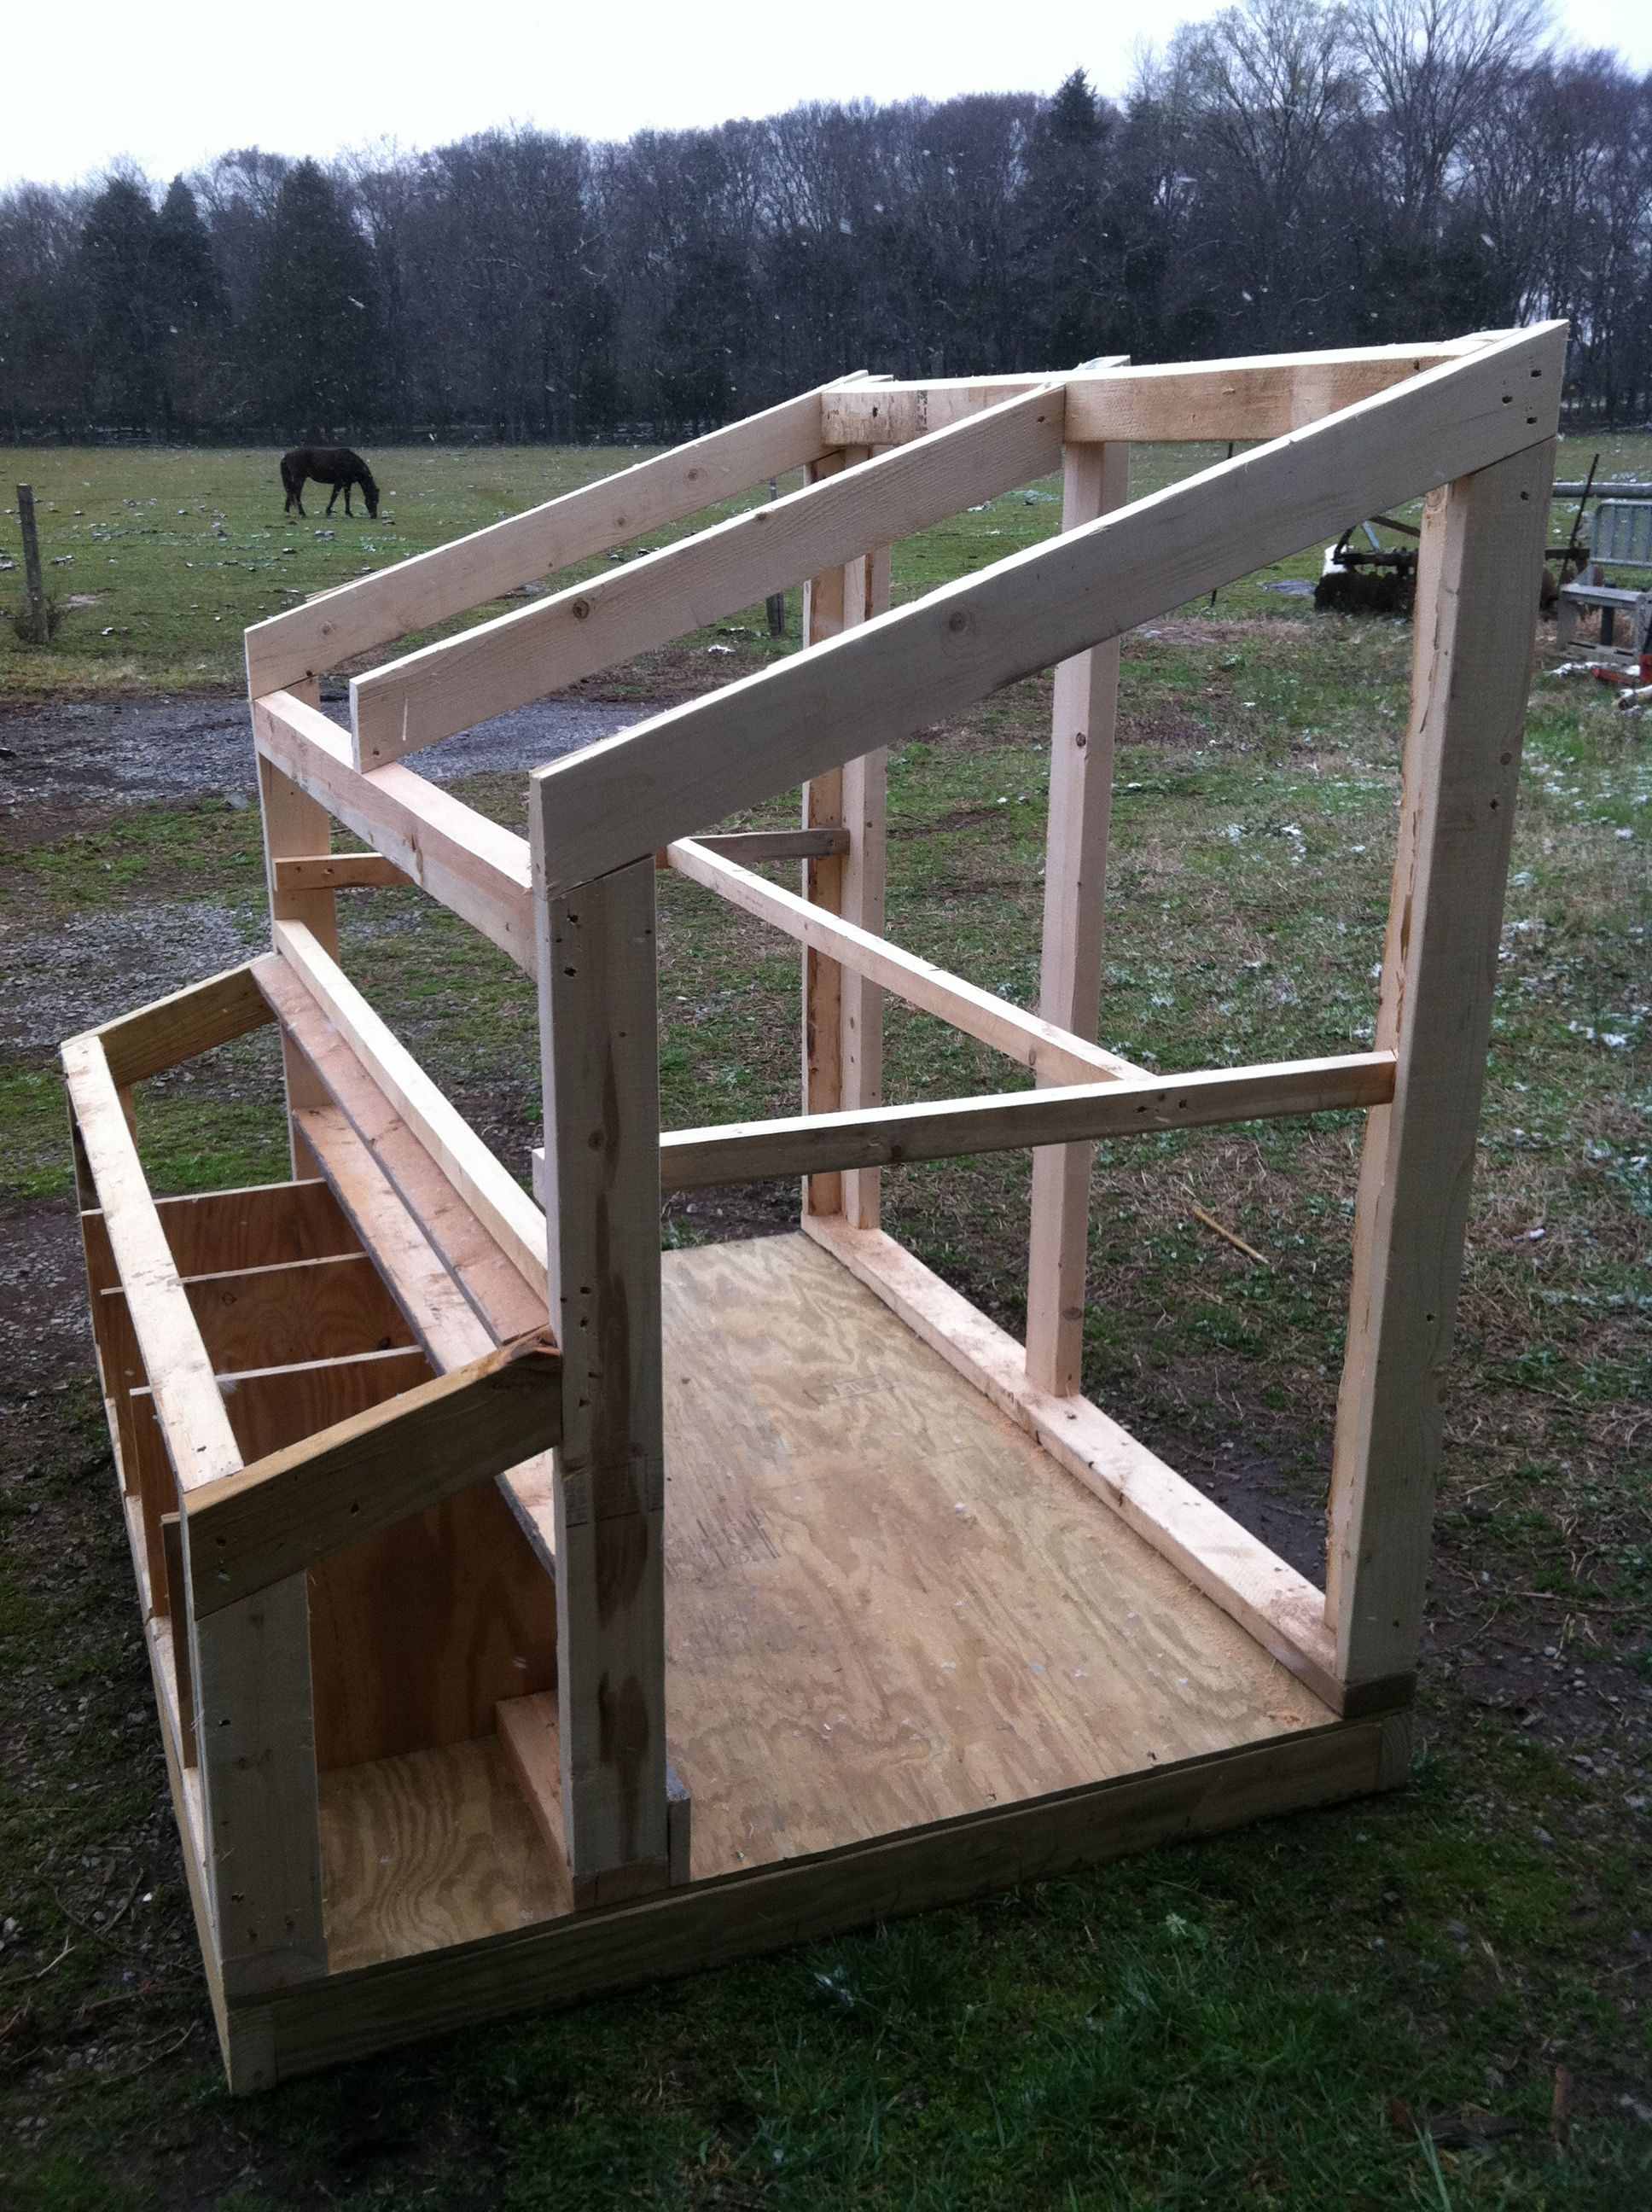 22 Low Budget Diy Backyard Chicken Coop Plans: Chickens Backyard